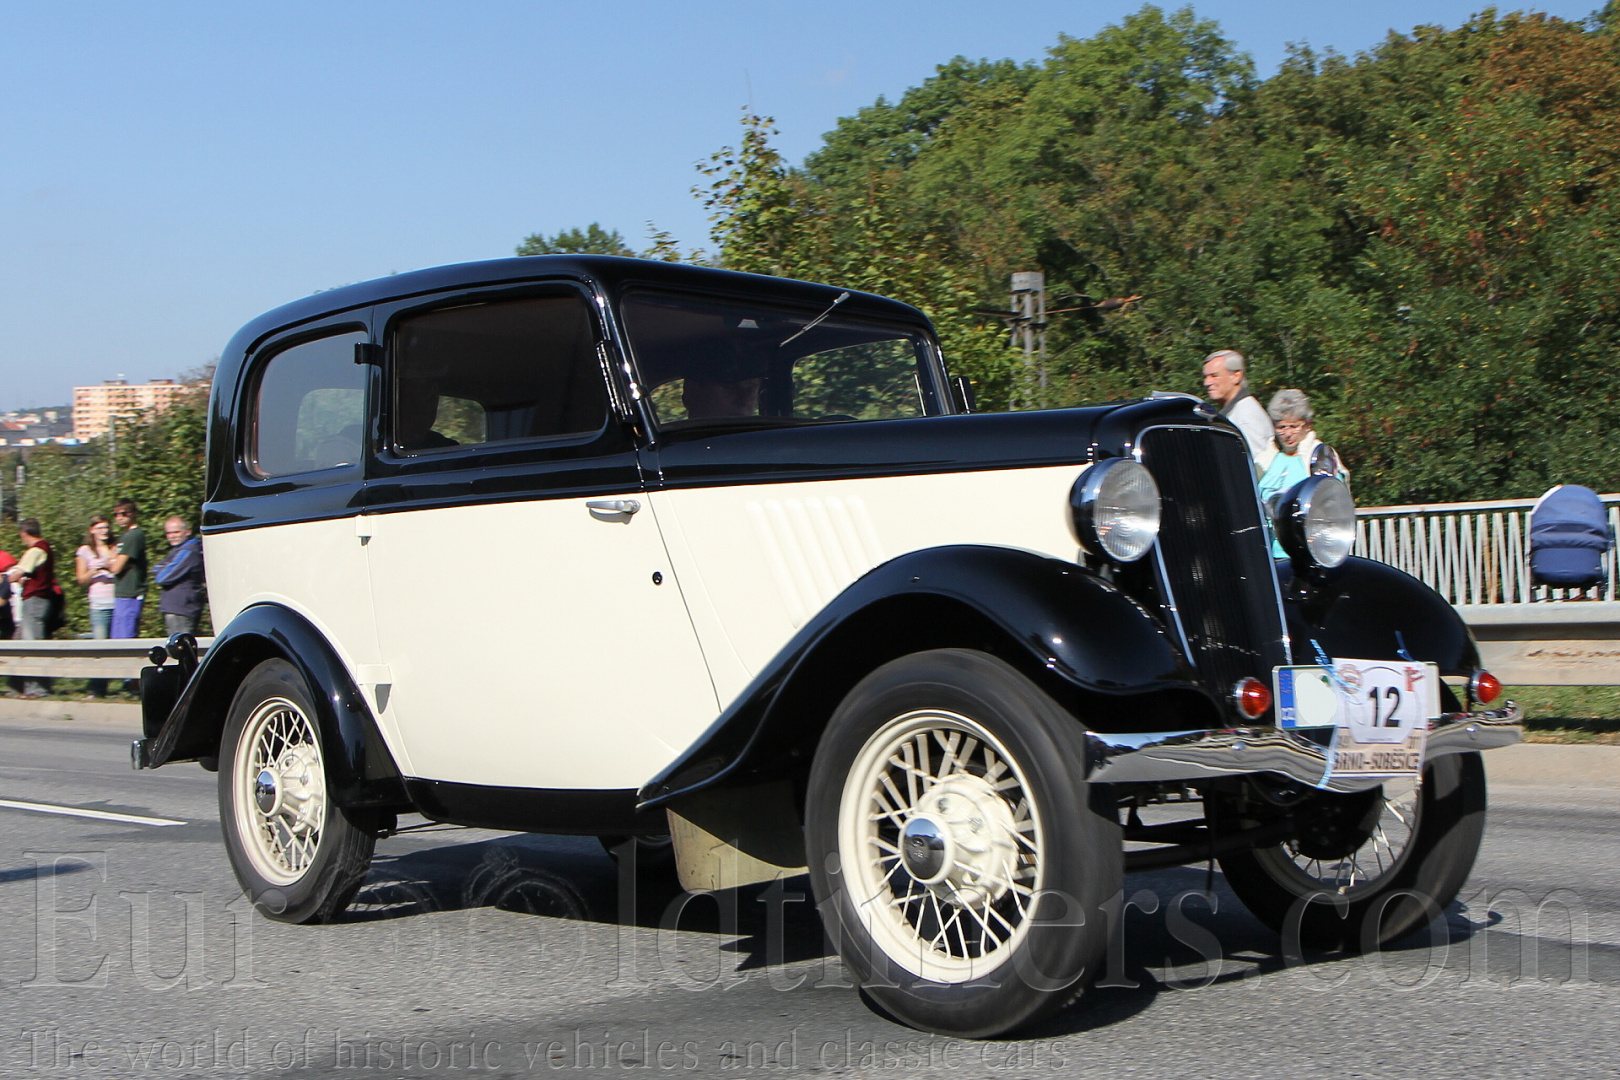 1934 ford k ln gallery veter ni i veter n oldtimers historick vozidla. Black Bedroom Furniture Sets. Home Design Ideas